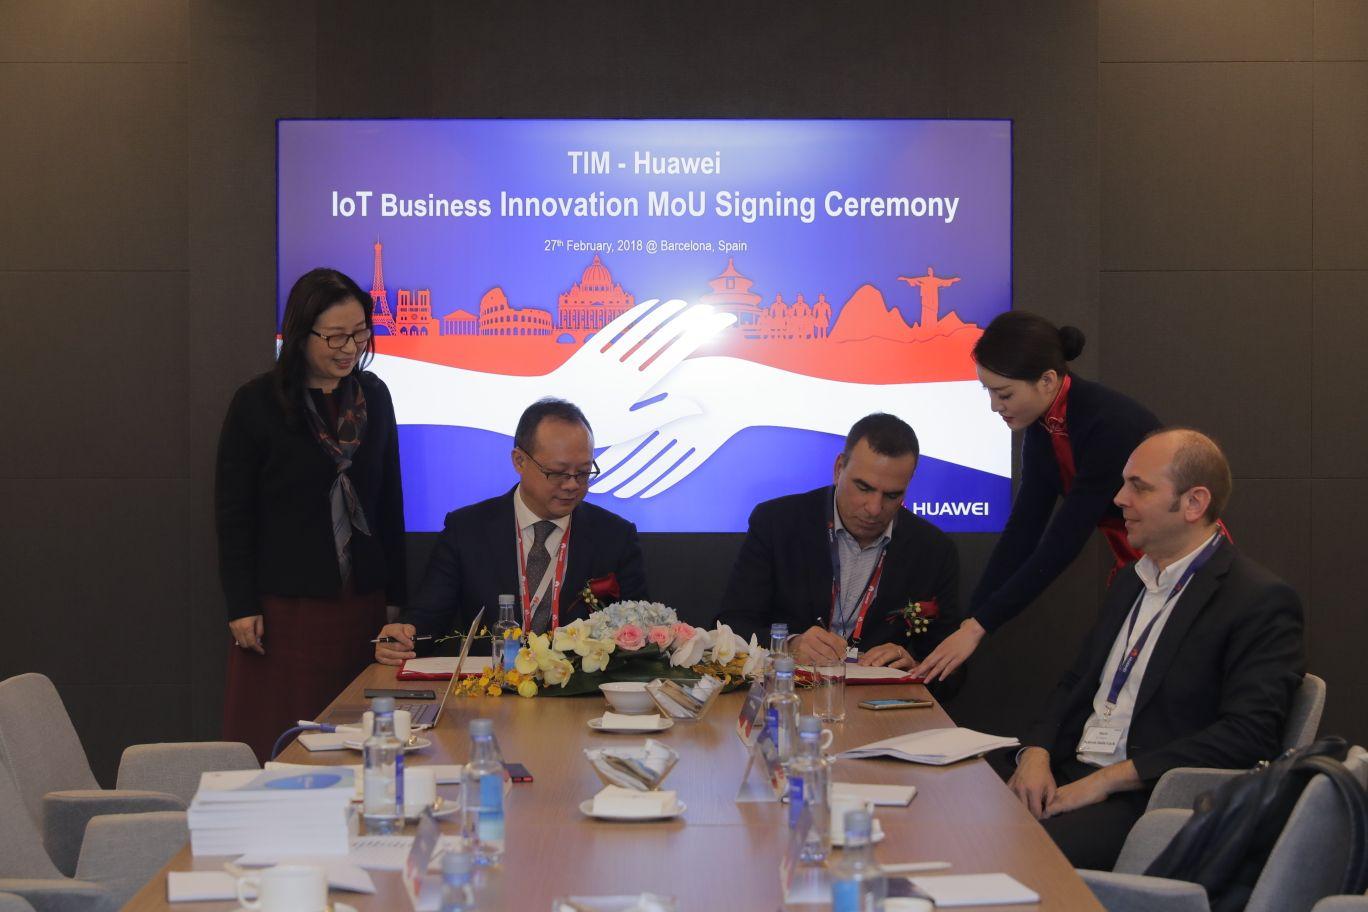 Business Innovation tim huawei